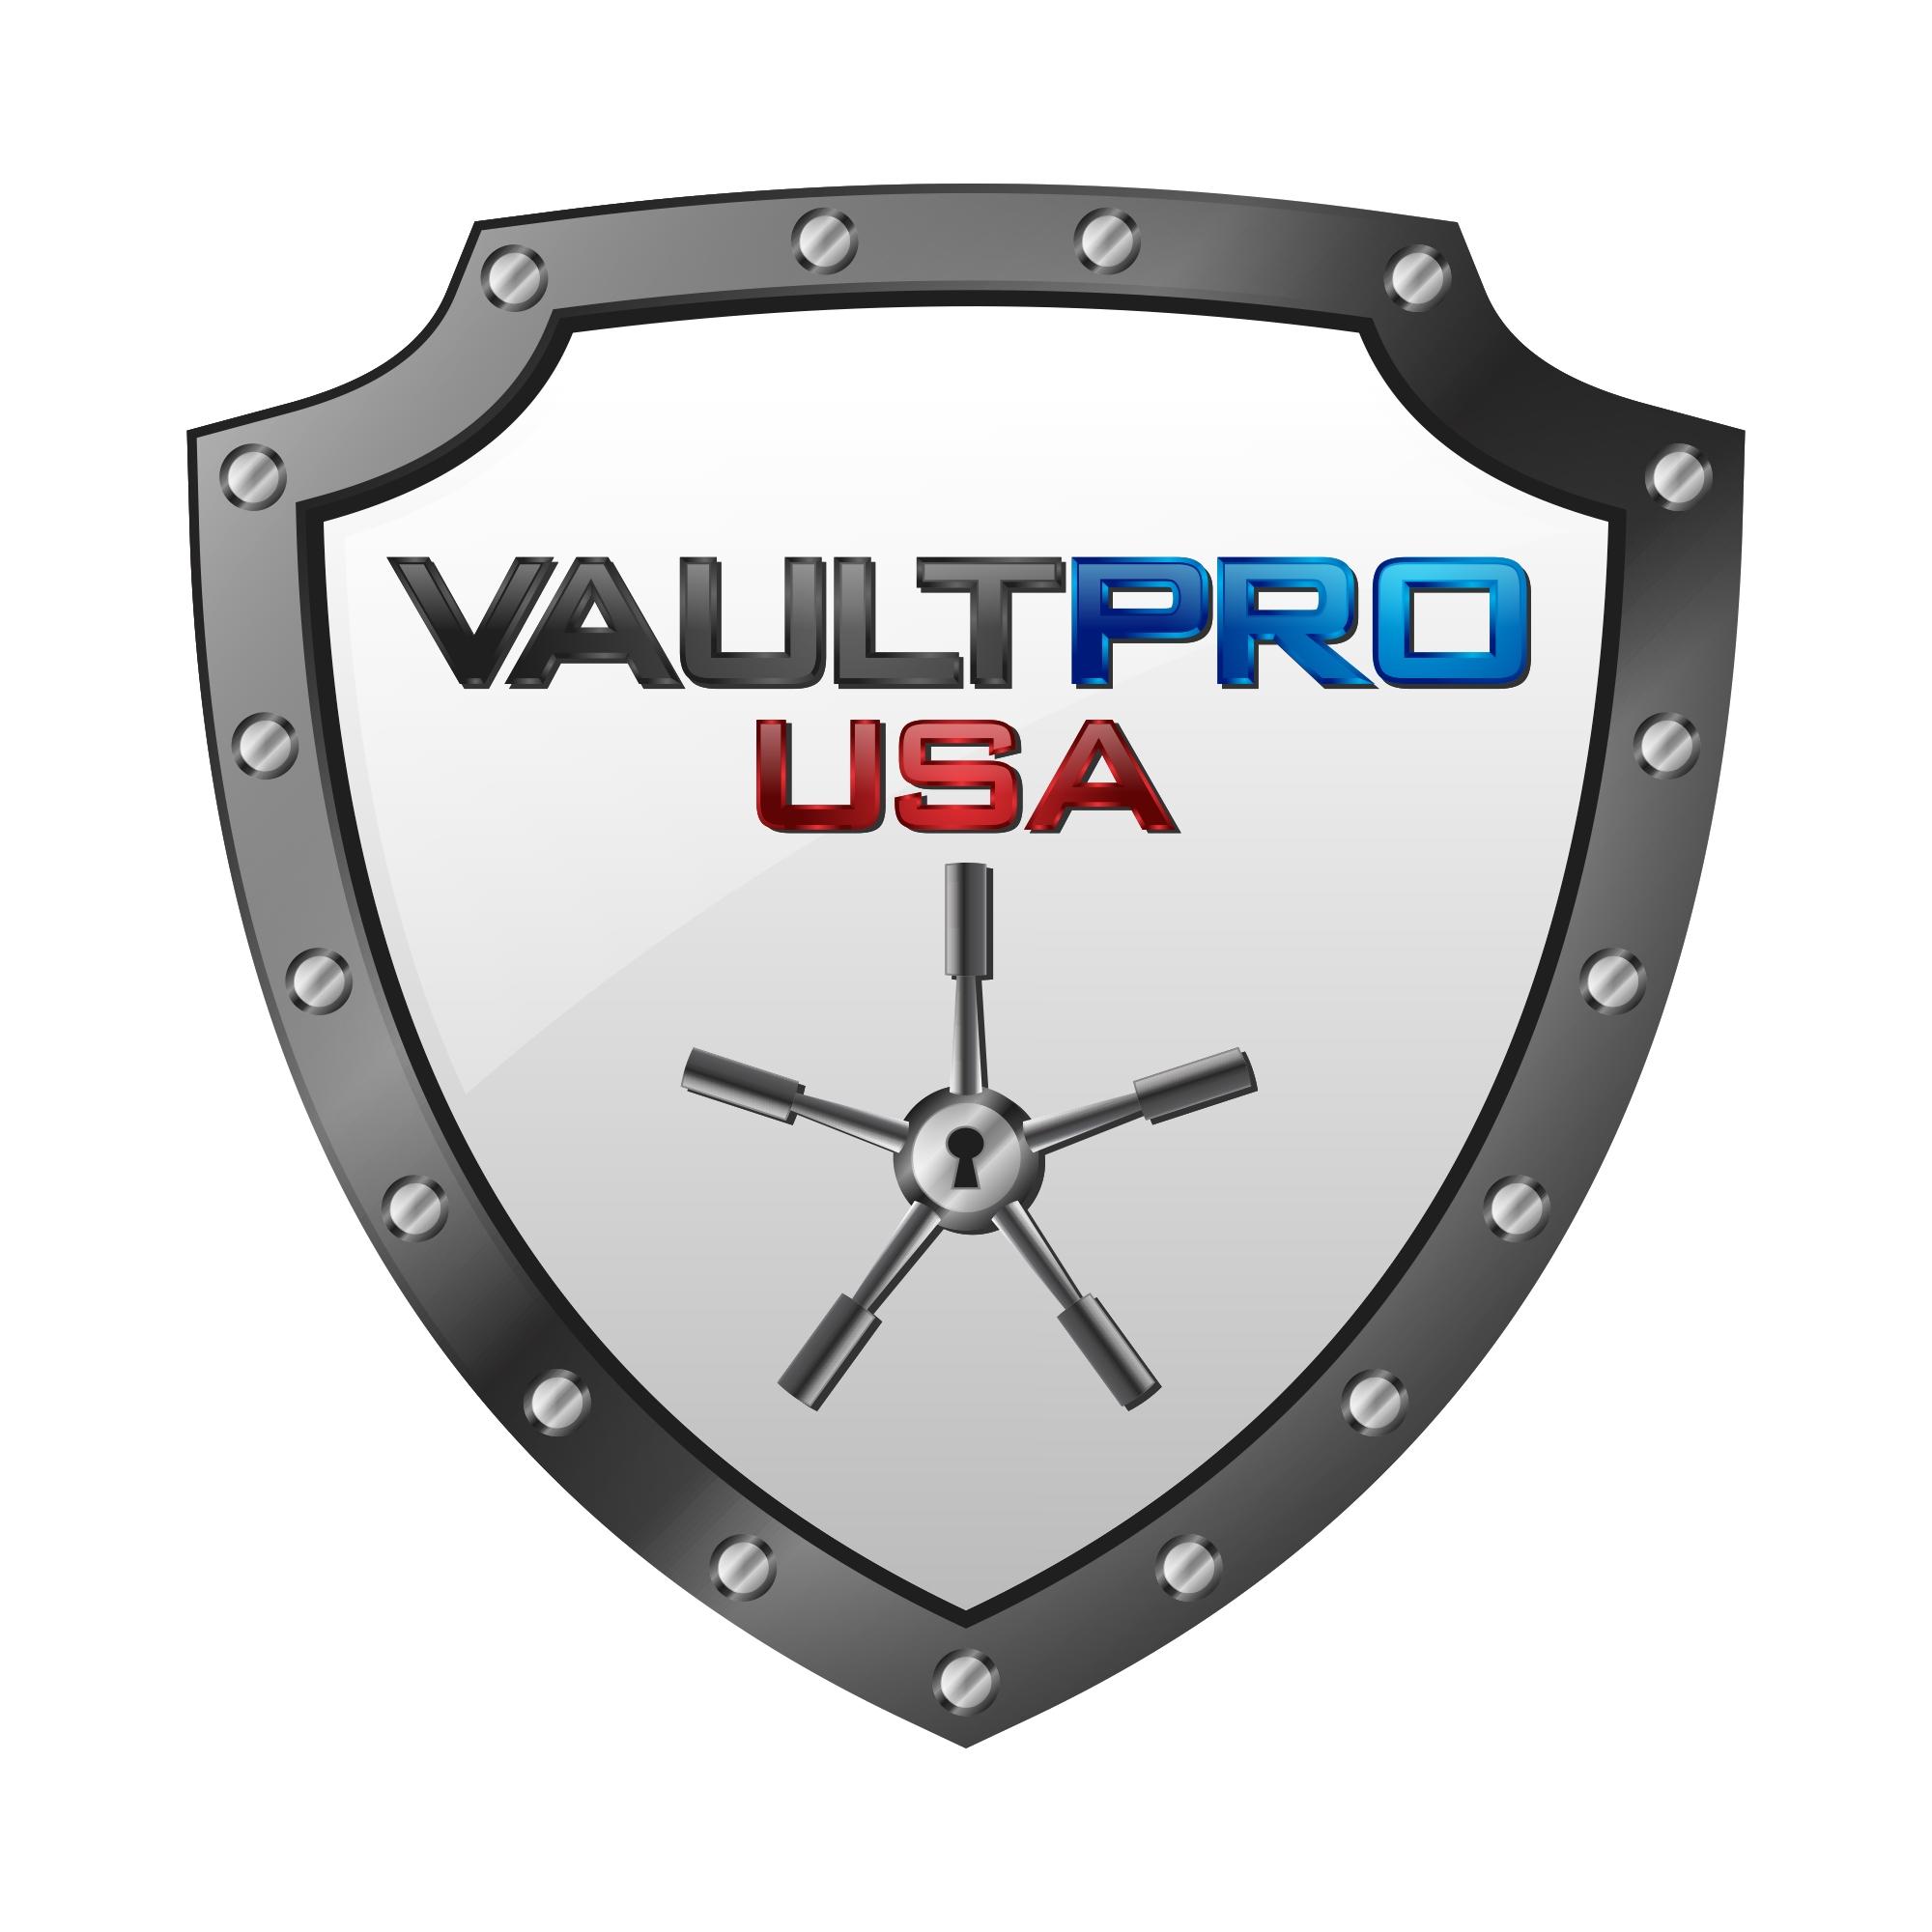 Vault Pro USA logo